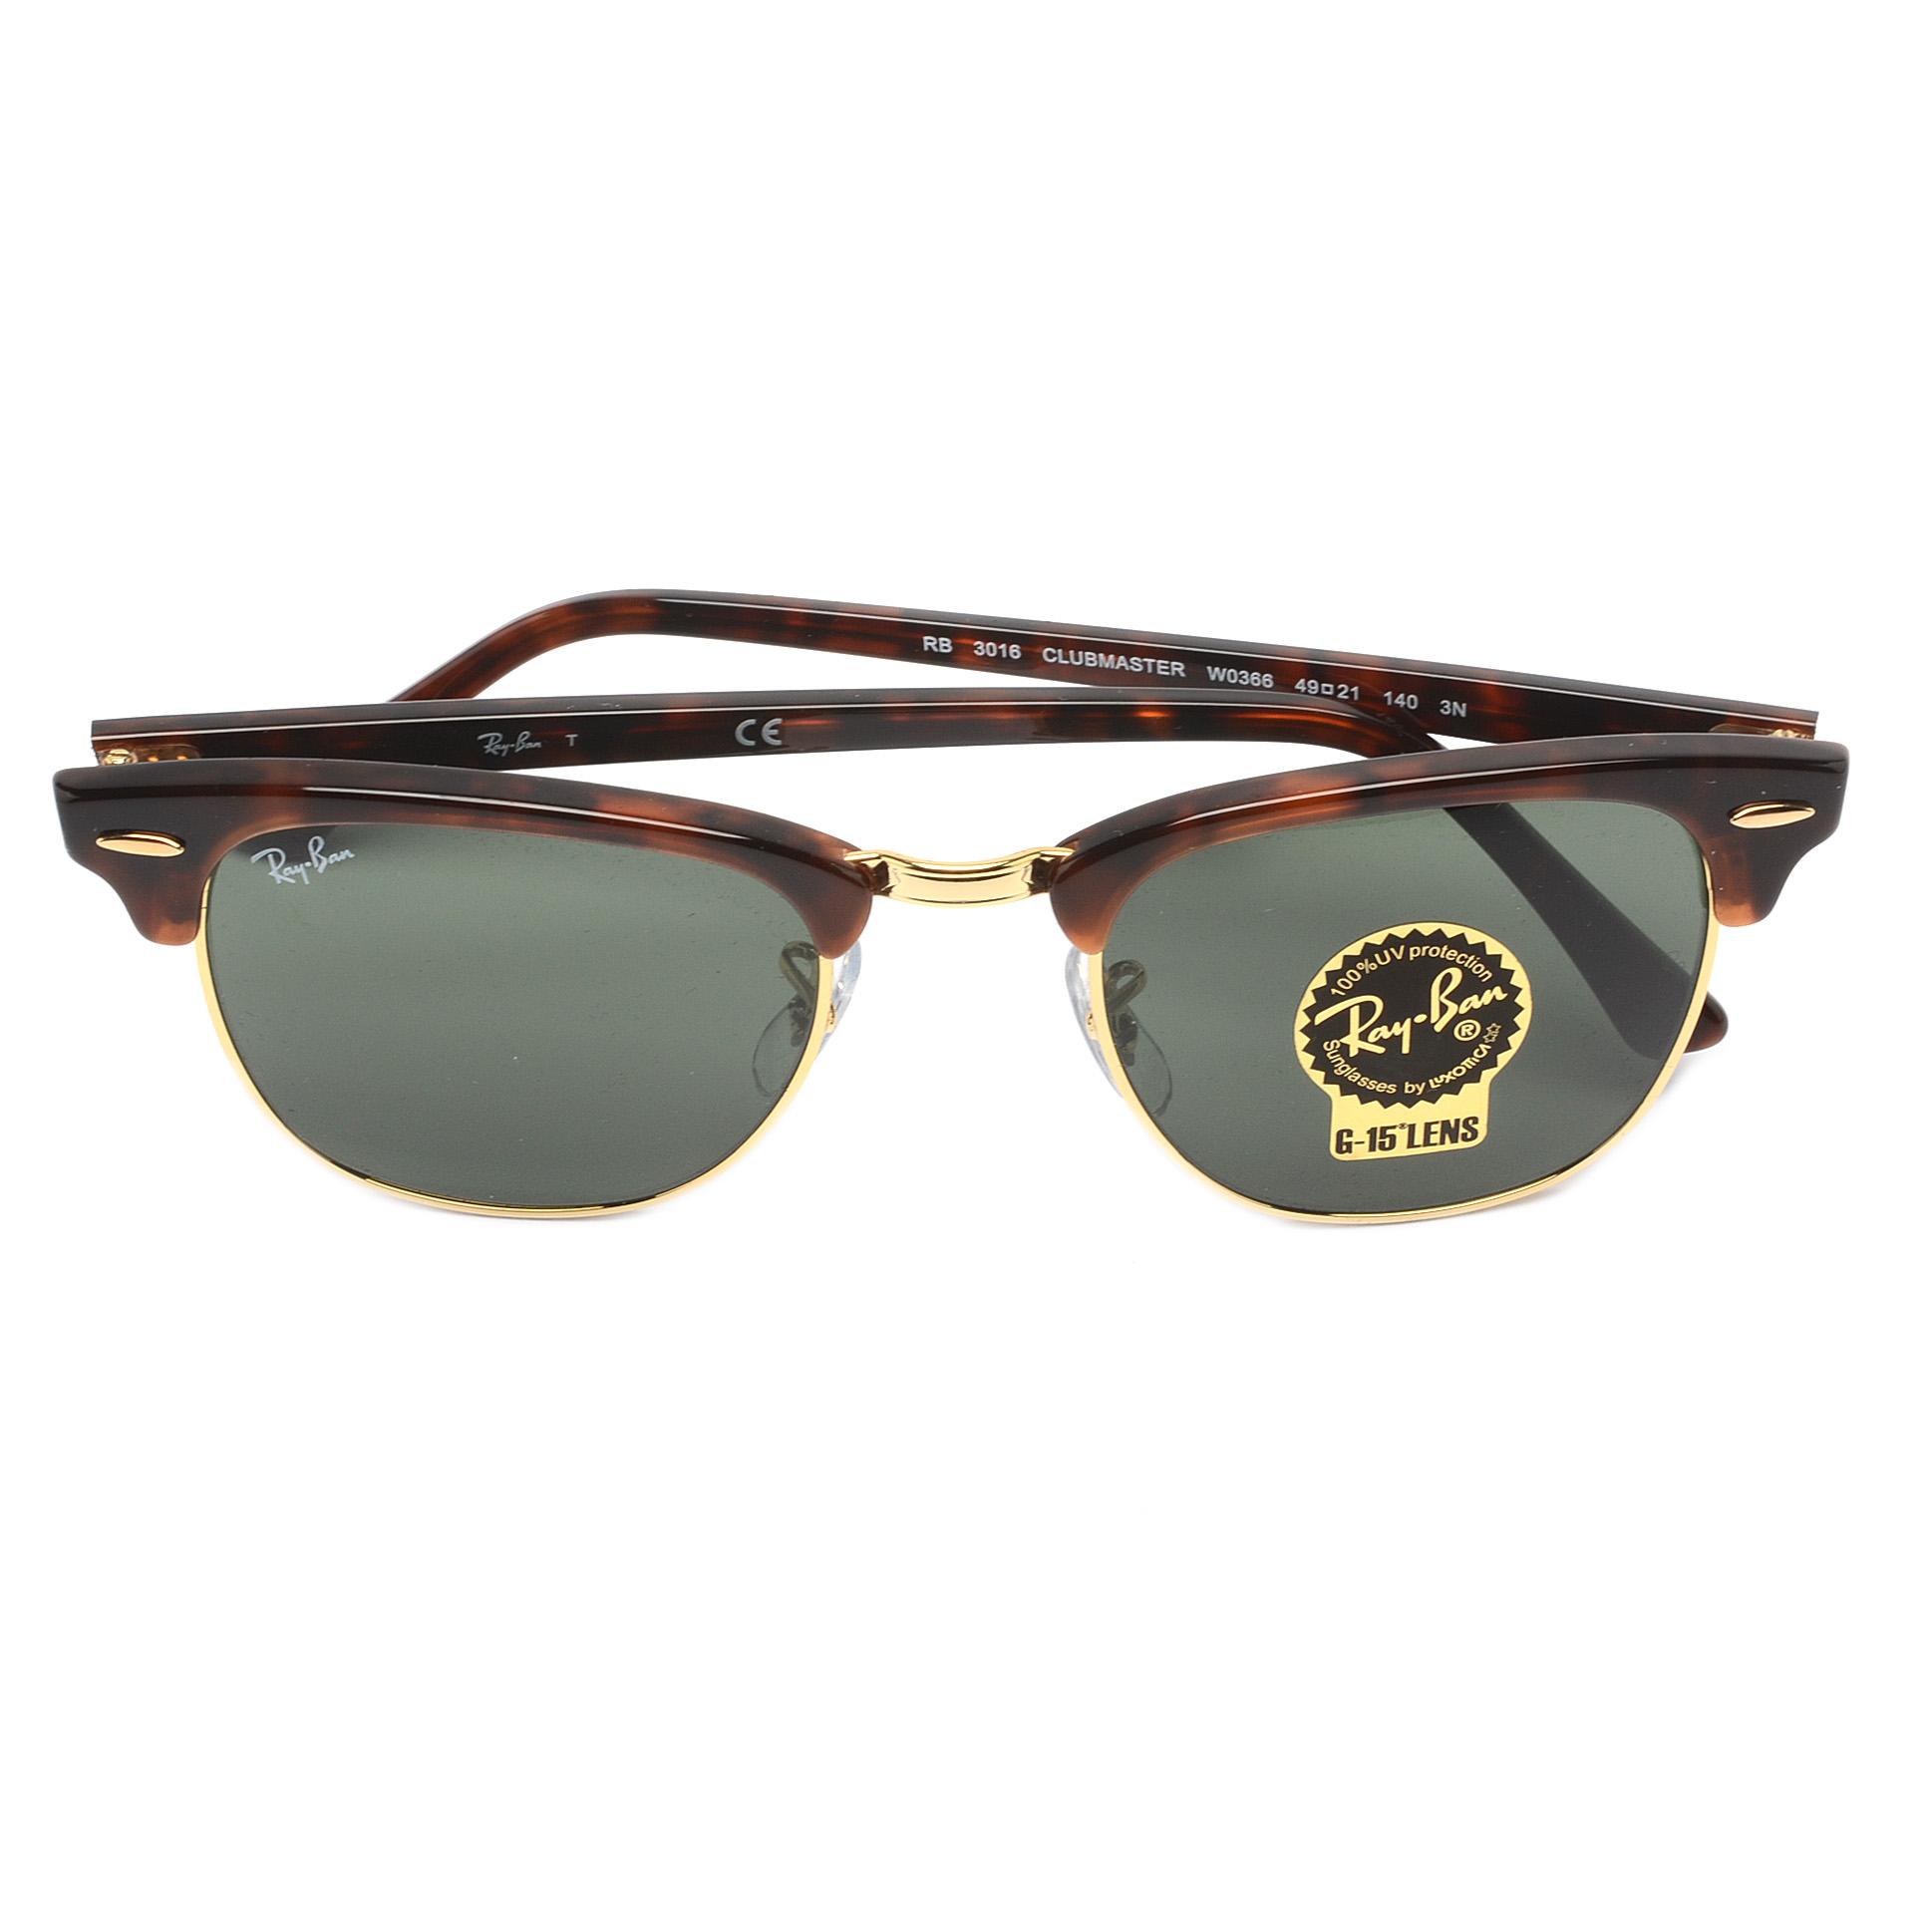 5c25026c33e40 ... rb3016 1160 49 21 clubmaster fleck tortoise sunglasses official online  store 38fd9 3396e  low cost ray ban clubmaster sunglasses ebd1e 9c970